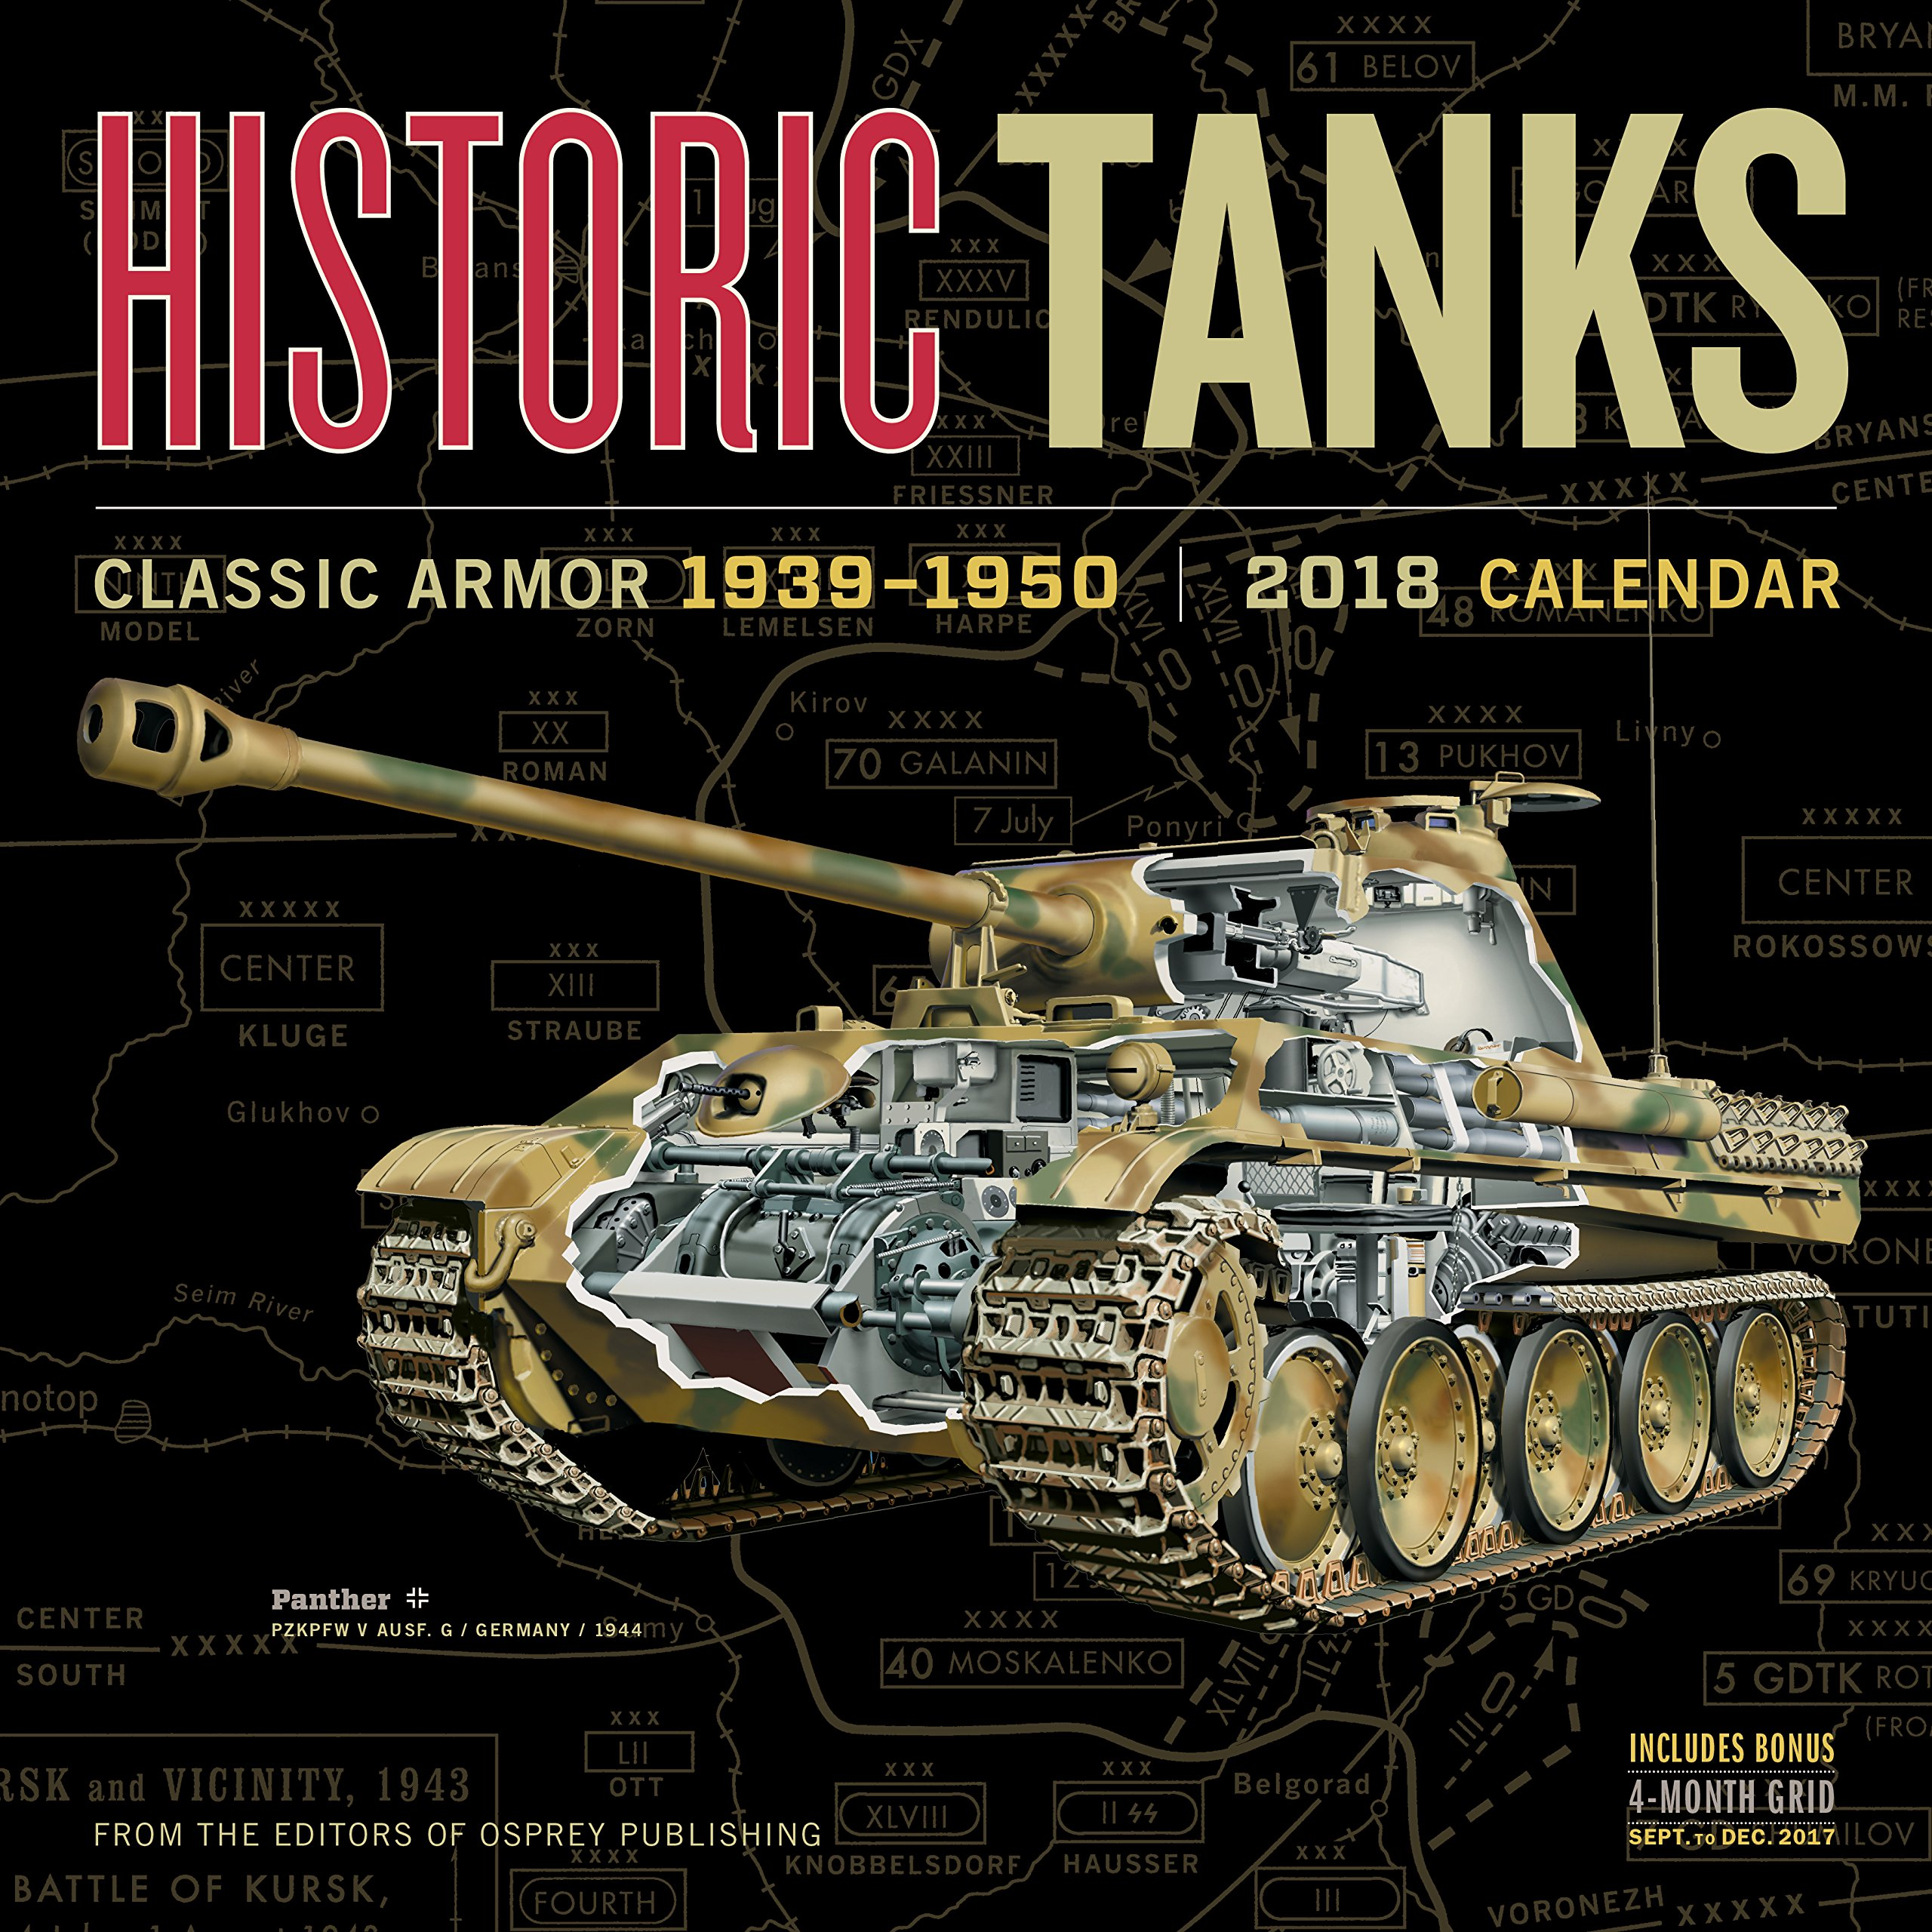 World Of Tanks Advent Calendar 2020.Historic Tanks Wall Calendar 2018 Editors Of Osprey Publishing